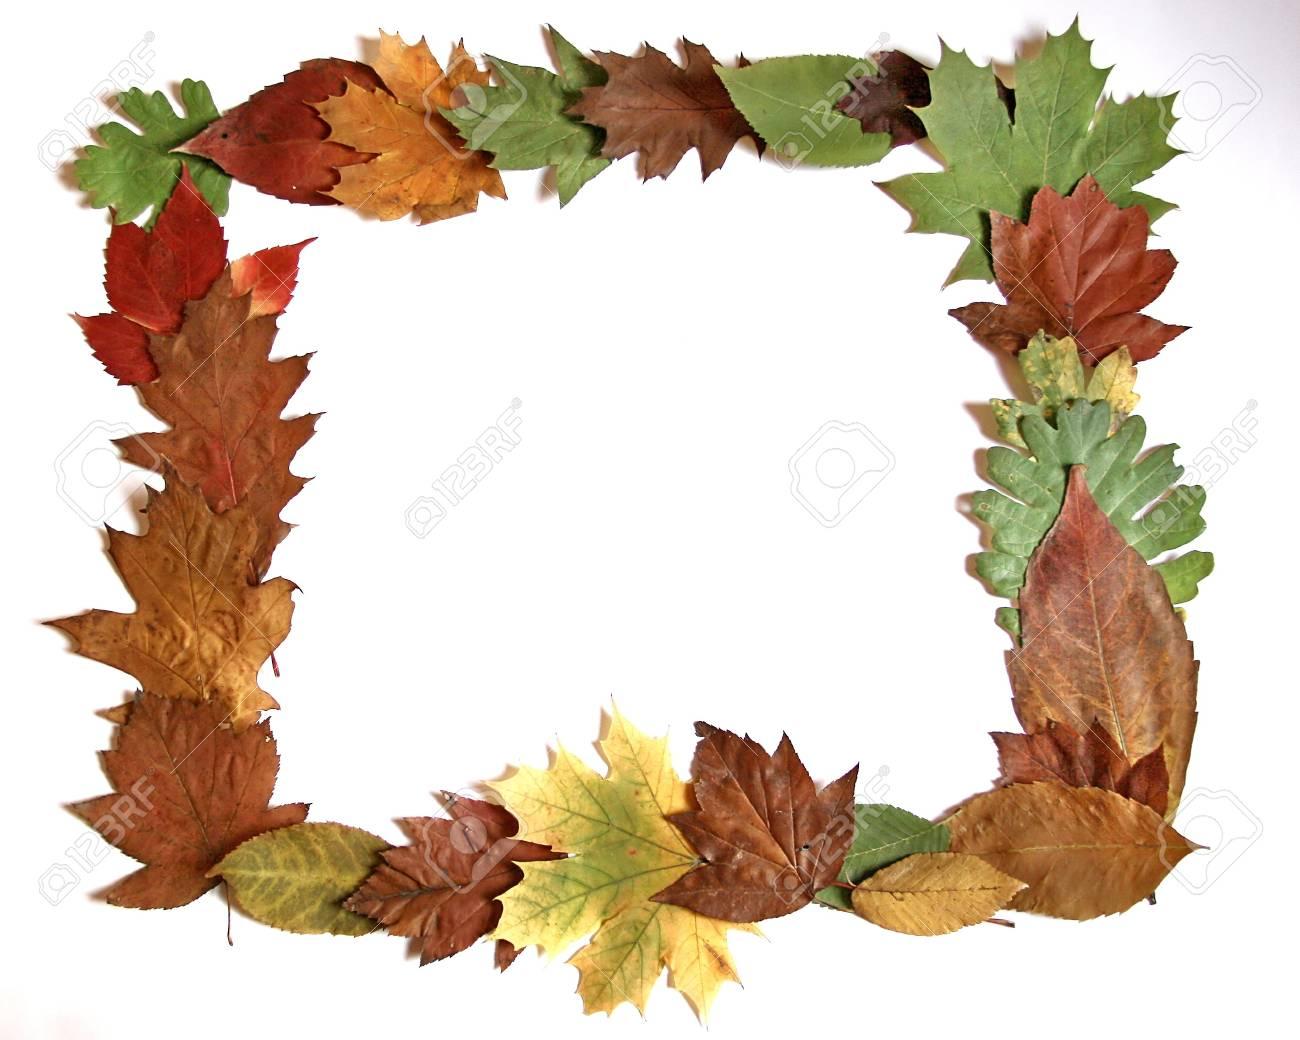 Autumn leaves frame Stock Photo - 16925950